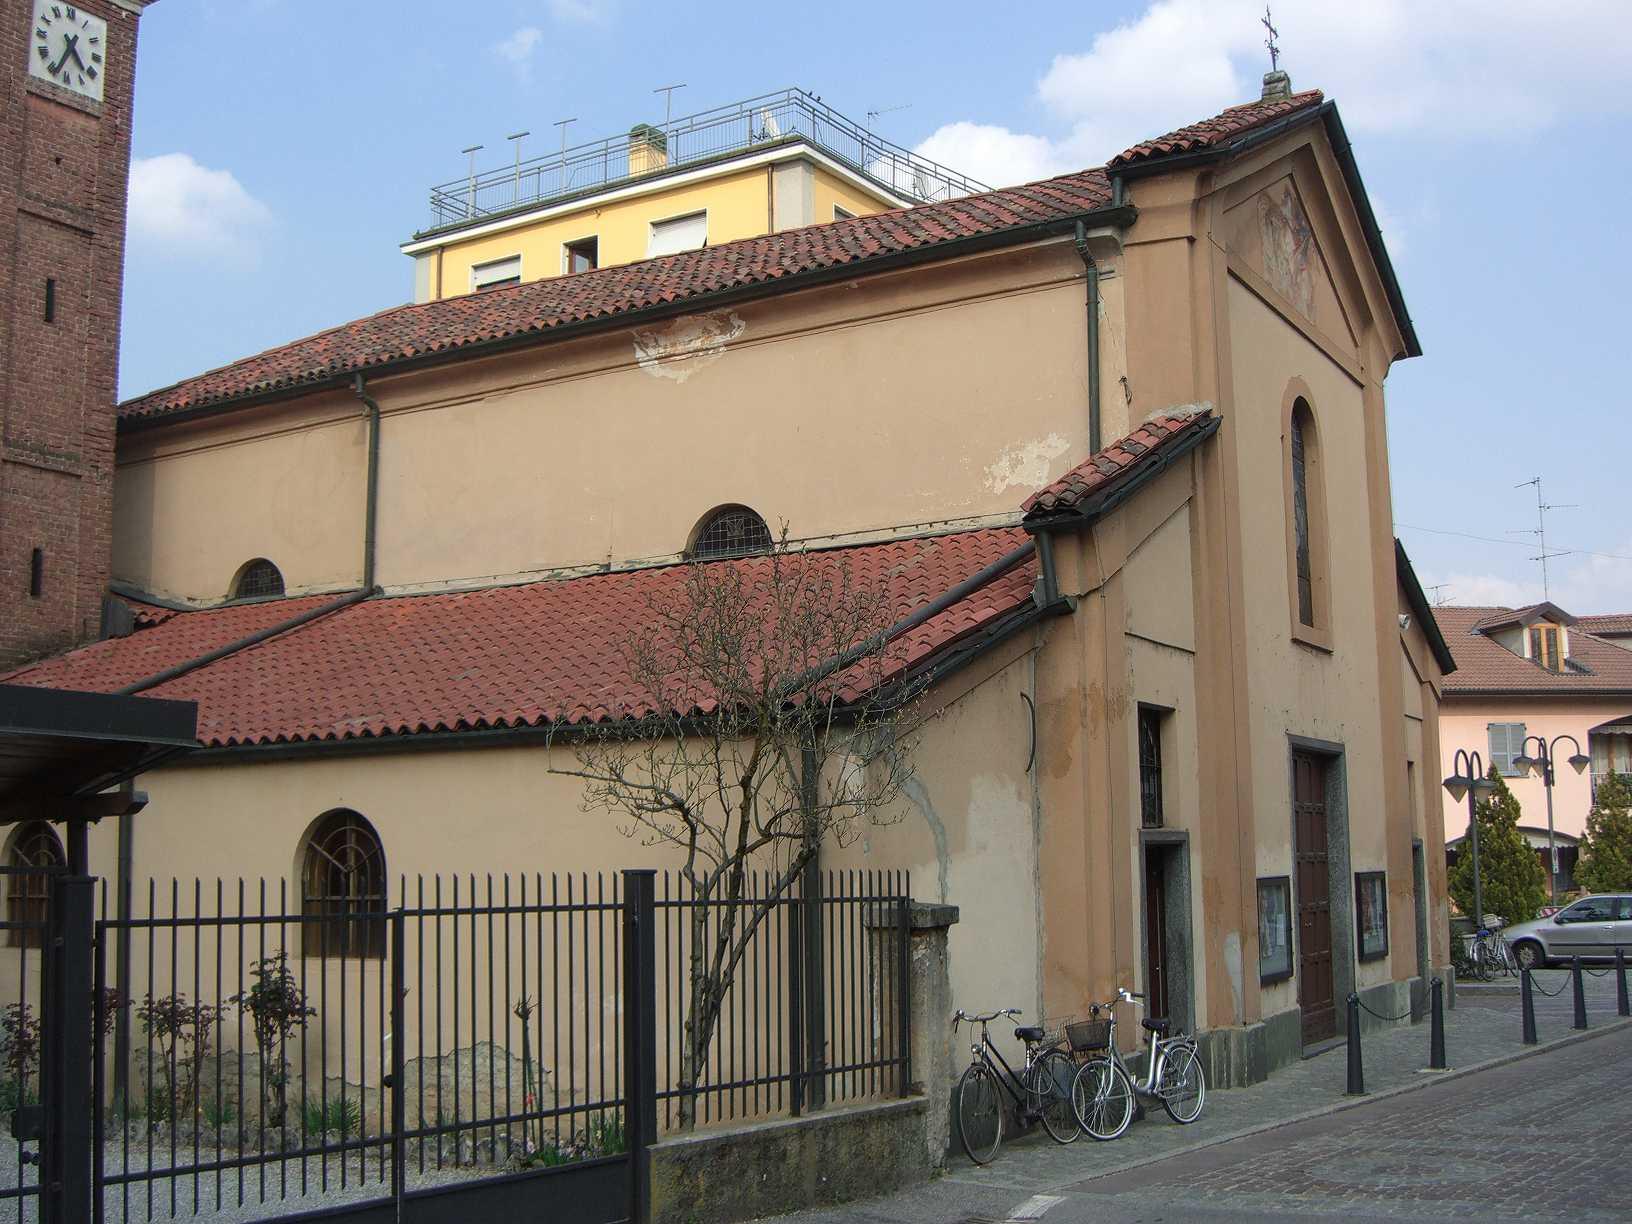 Biassono - Chiesa San Giorgio